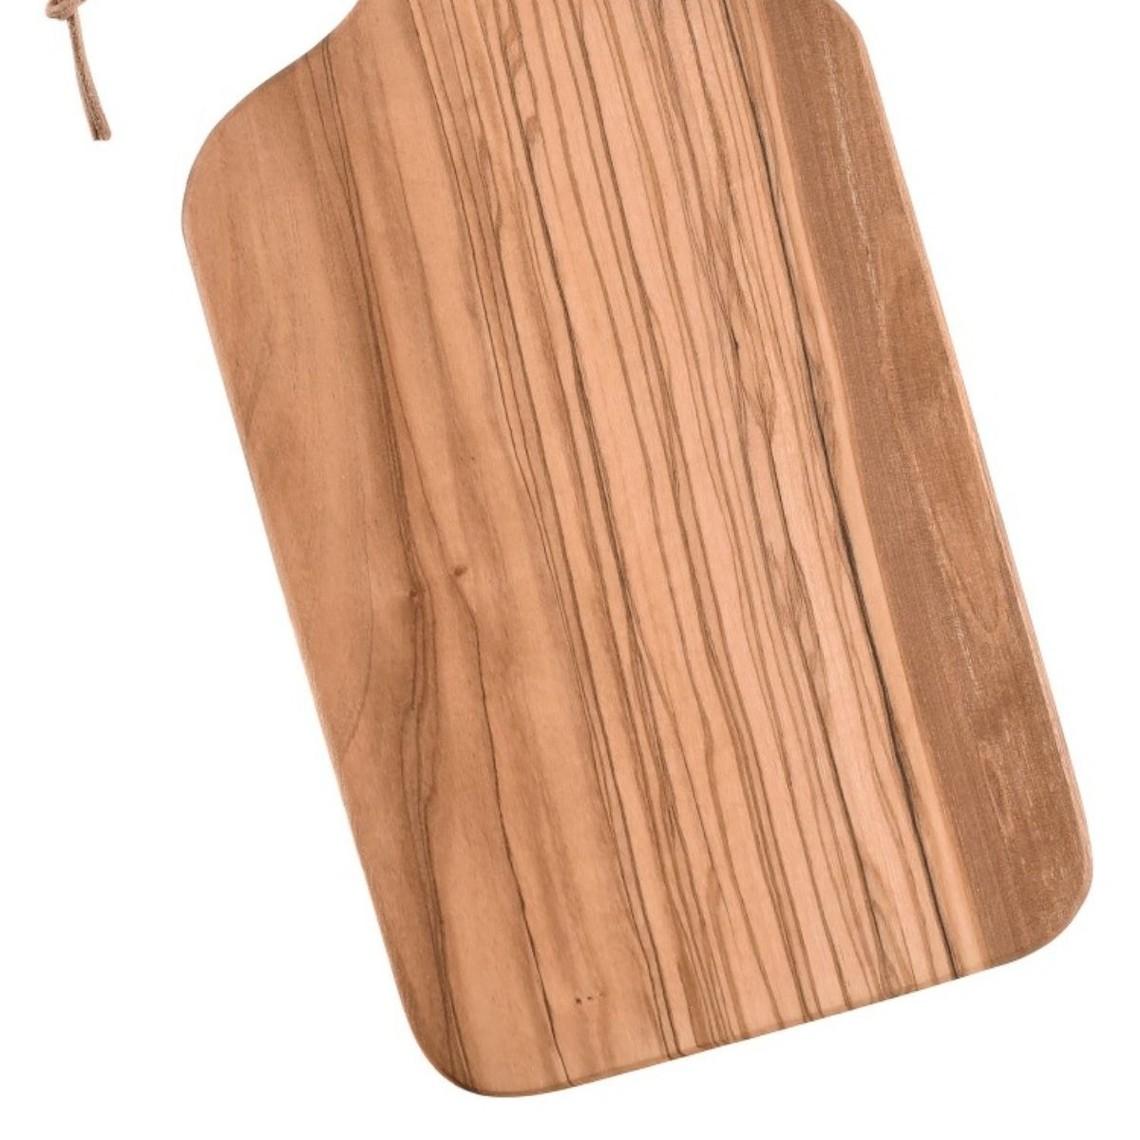 Tabla de cortar de madera de olivo, 30 x 14 x 1,3 cm.